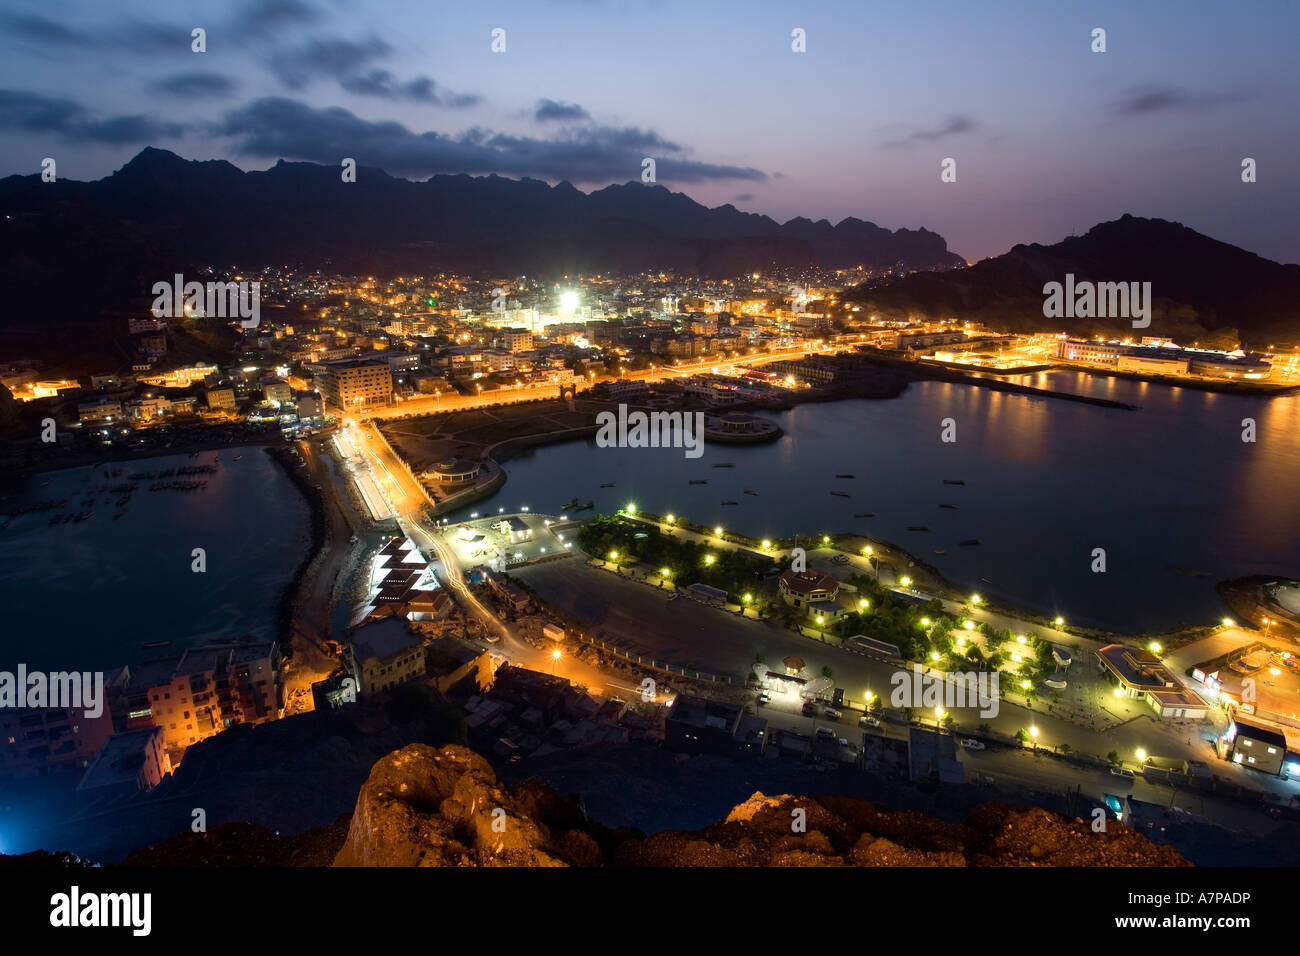 View of Crater Quarter from Sira Island, Aden, Yemen - Stock Image